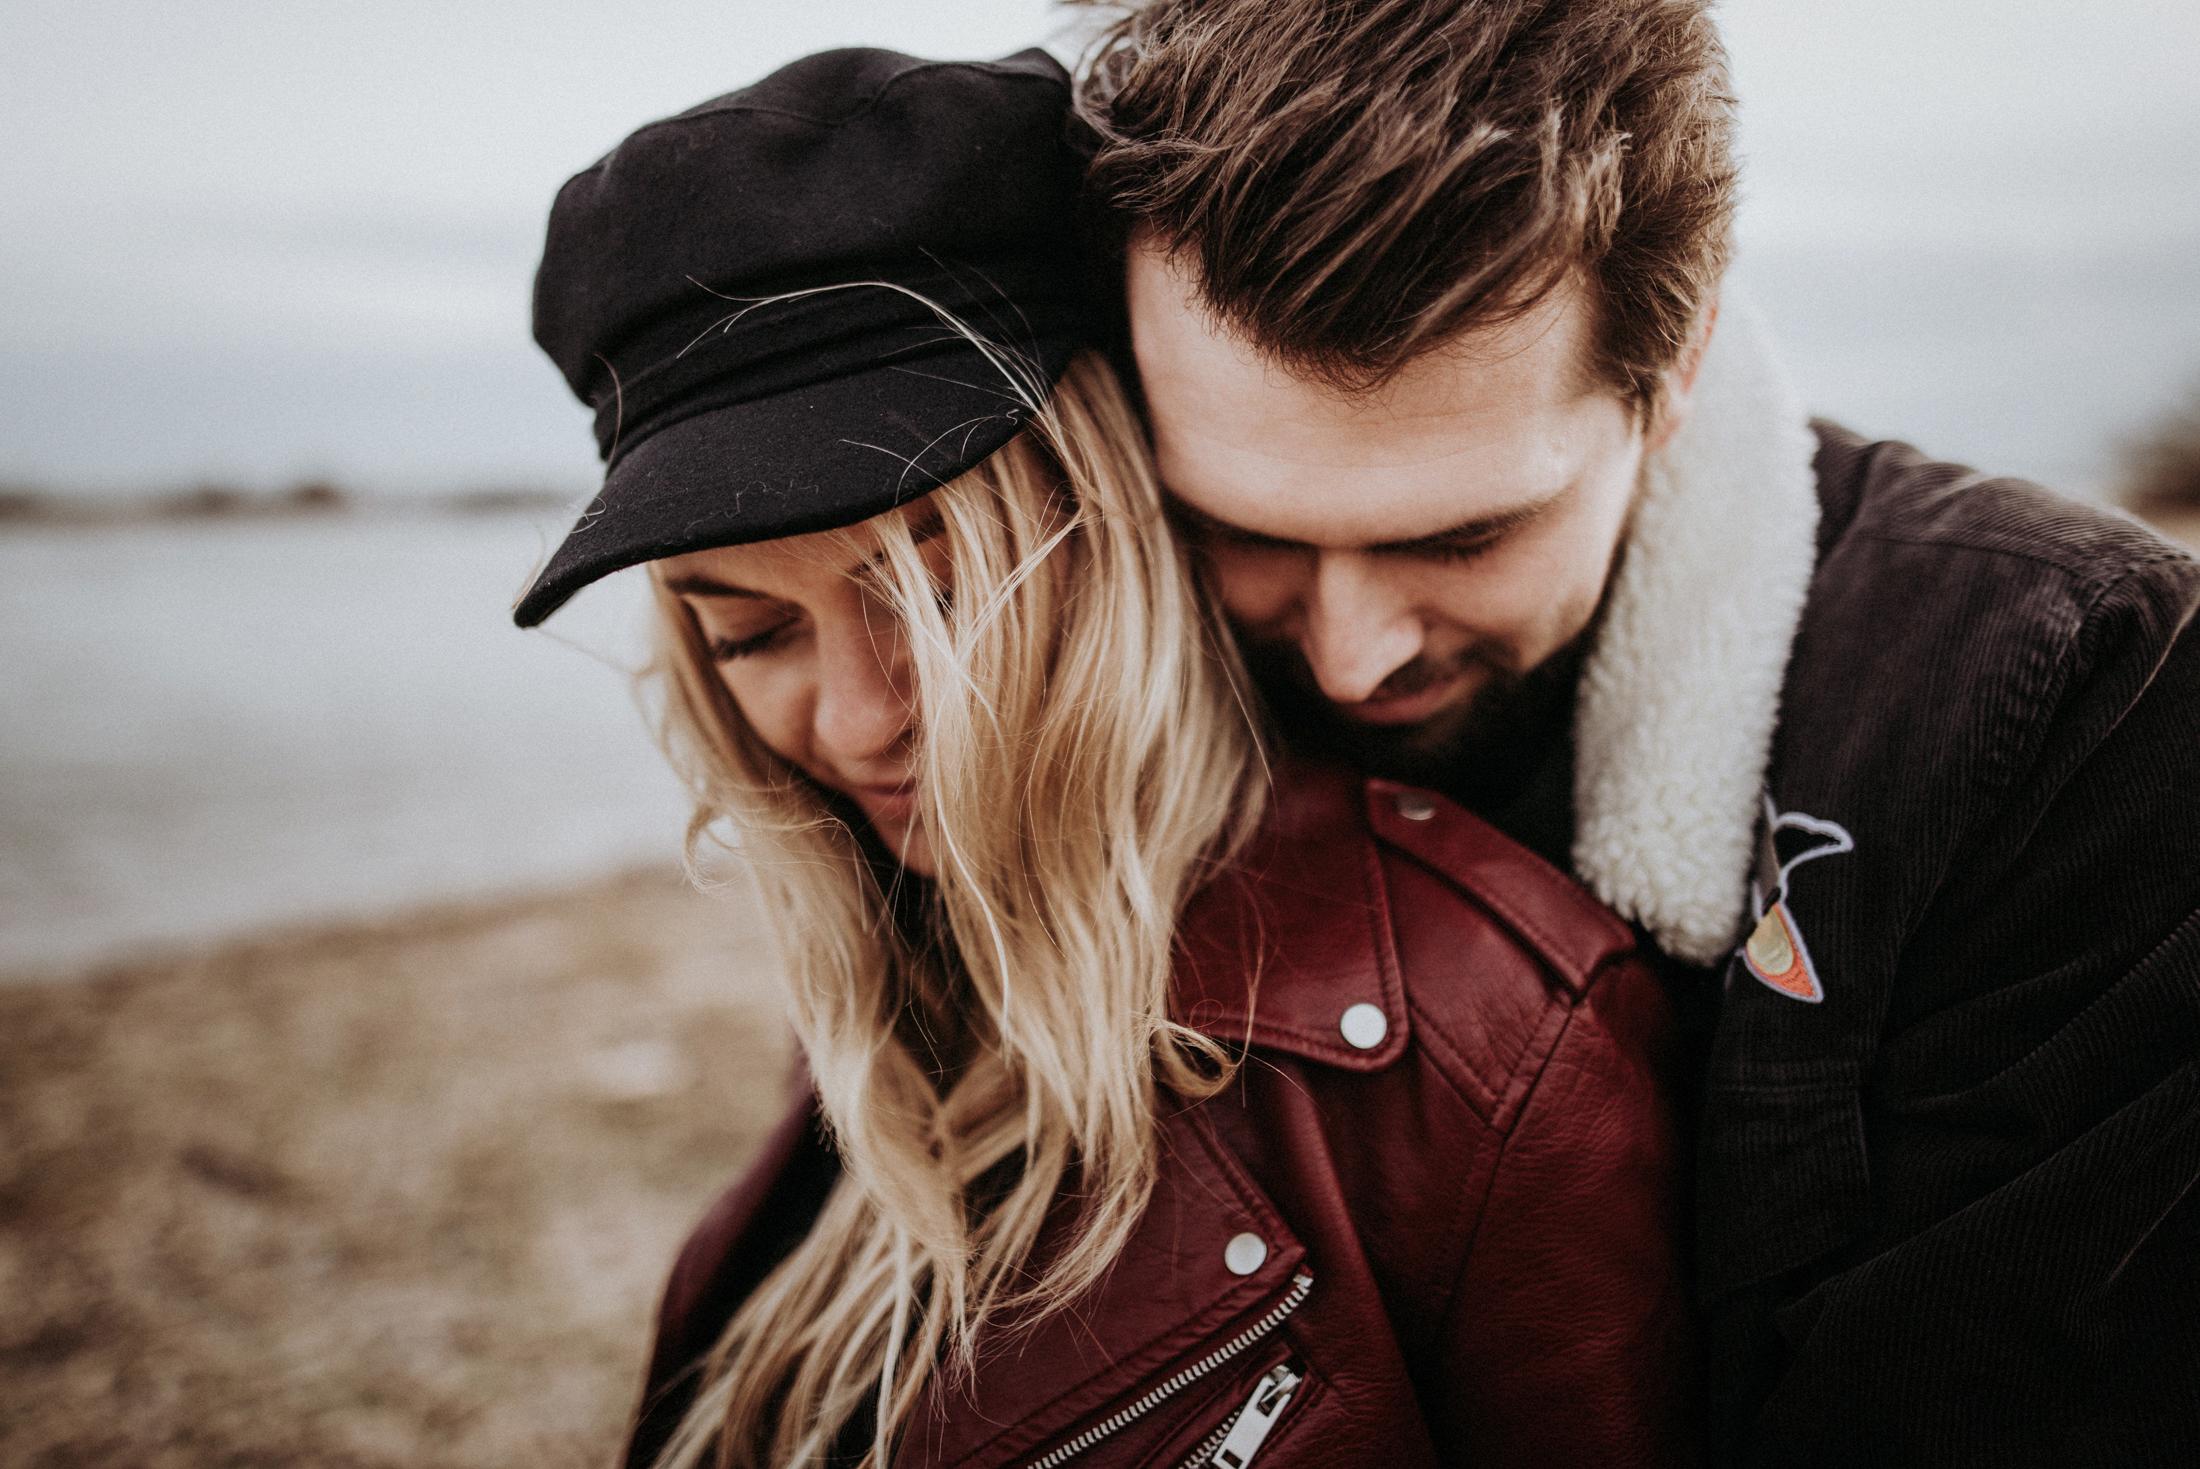 Wedding_Photographer_Mallorca_DanielaMarquardt_Photography_CanaryIslands_Lanzarote_Iceland_Tuscany_Santorini_Portugal_NewYork_Spain_Elopement_Hochzeitsfotograf_CK110